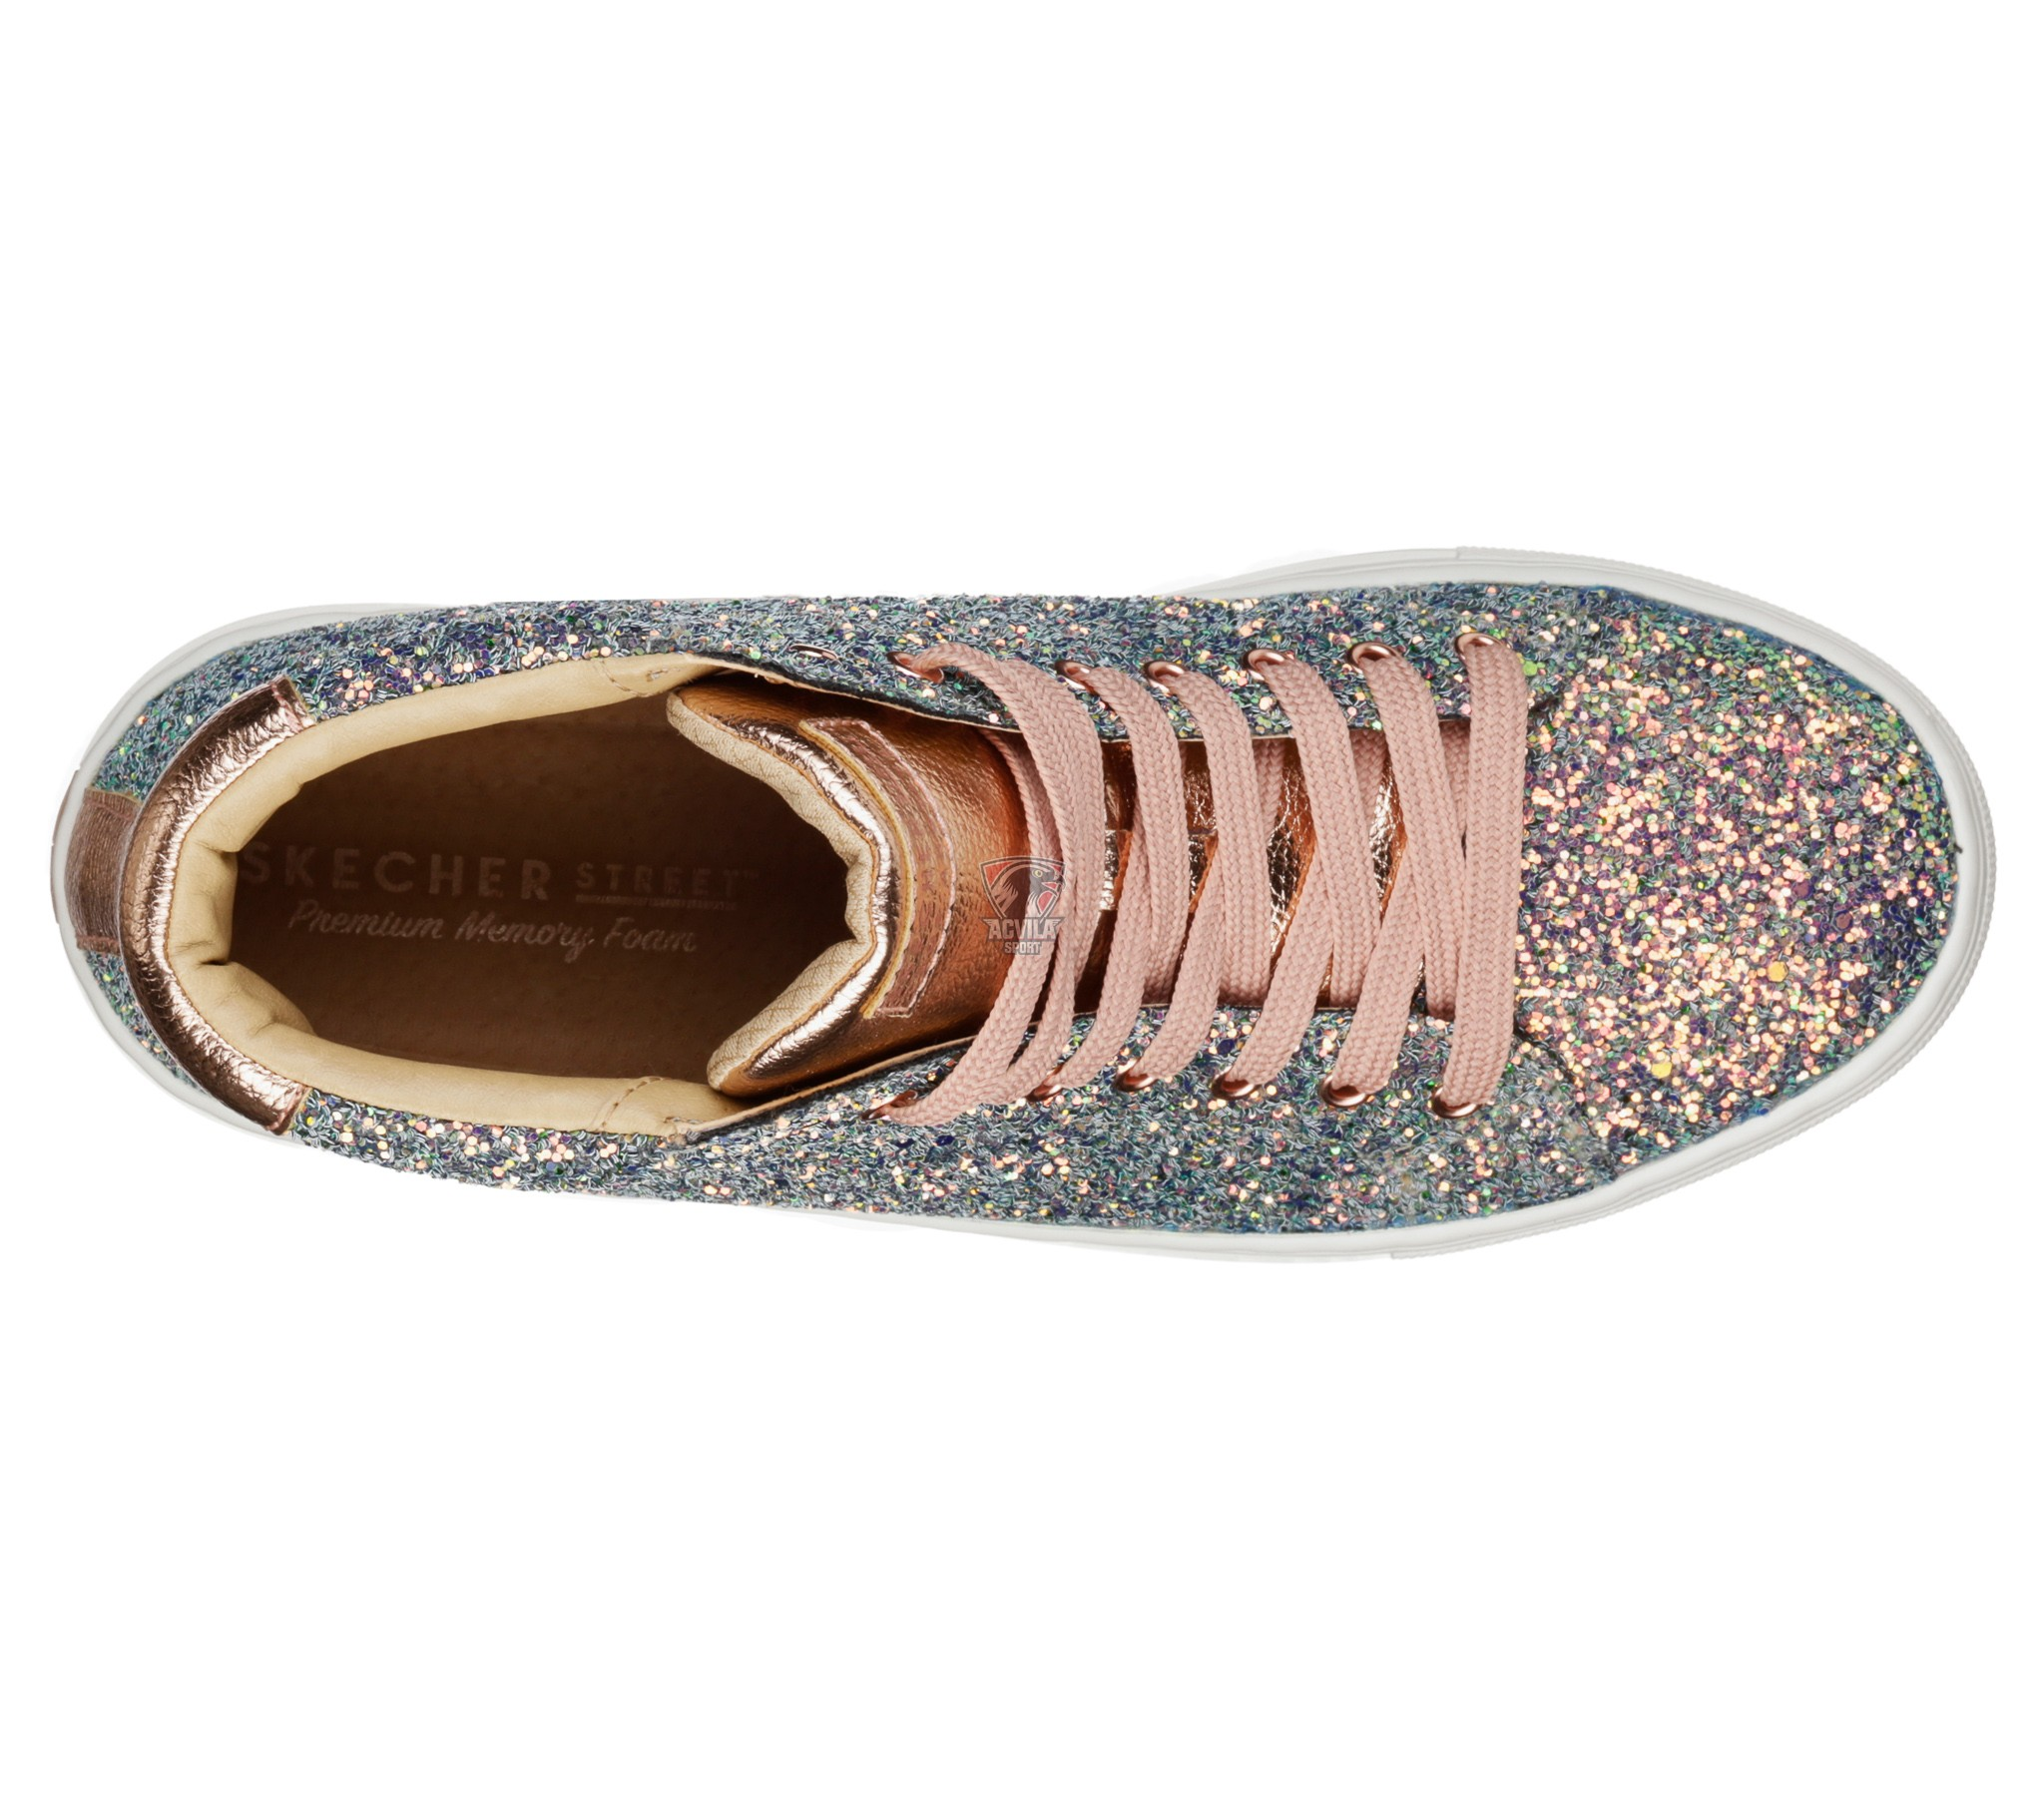 photo 1 Женская обувь SKECHERS SIDE STREET- NIGHT LIFE